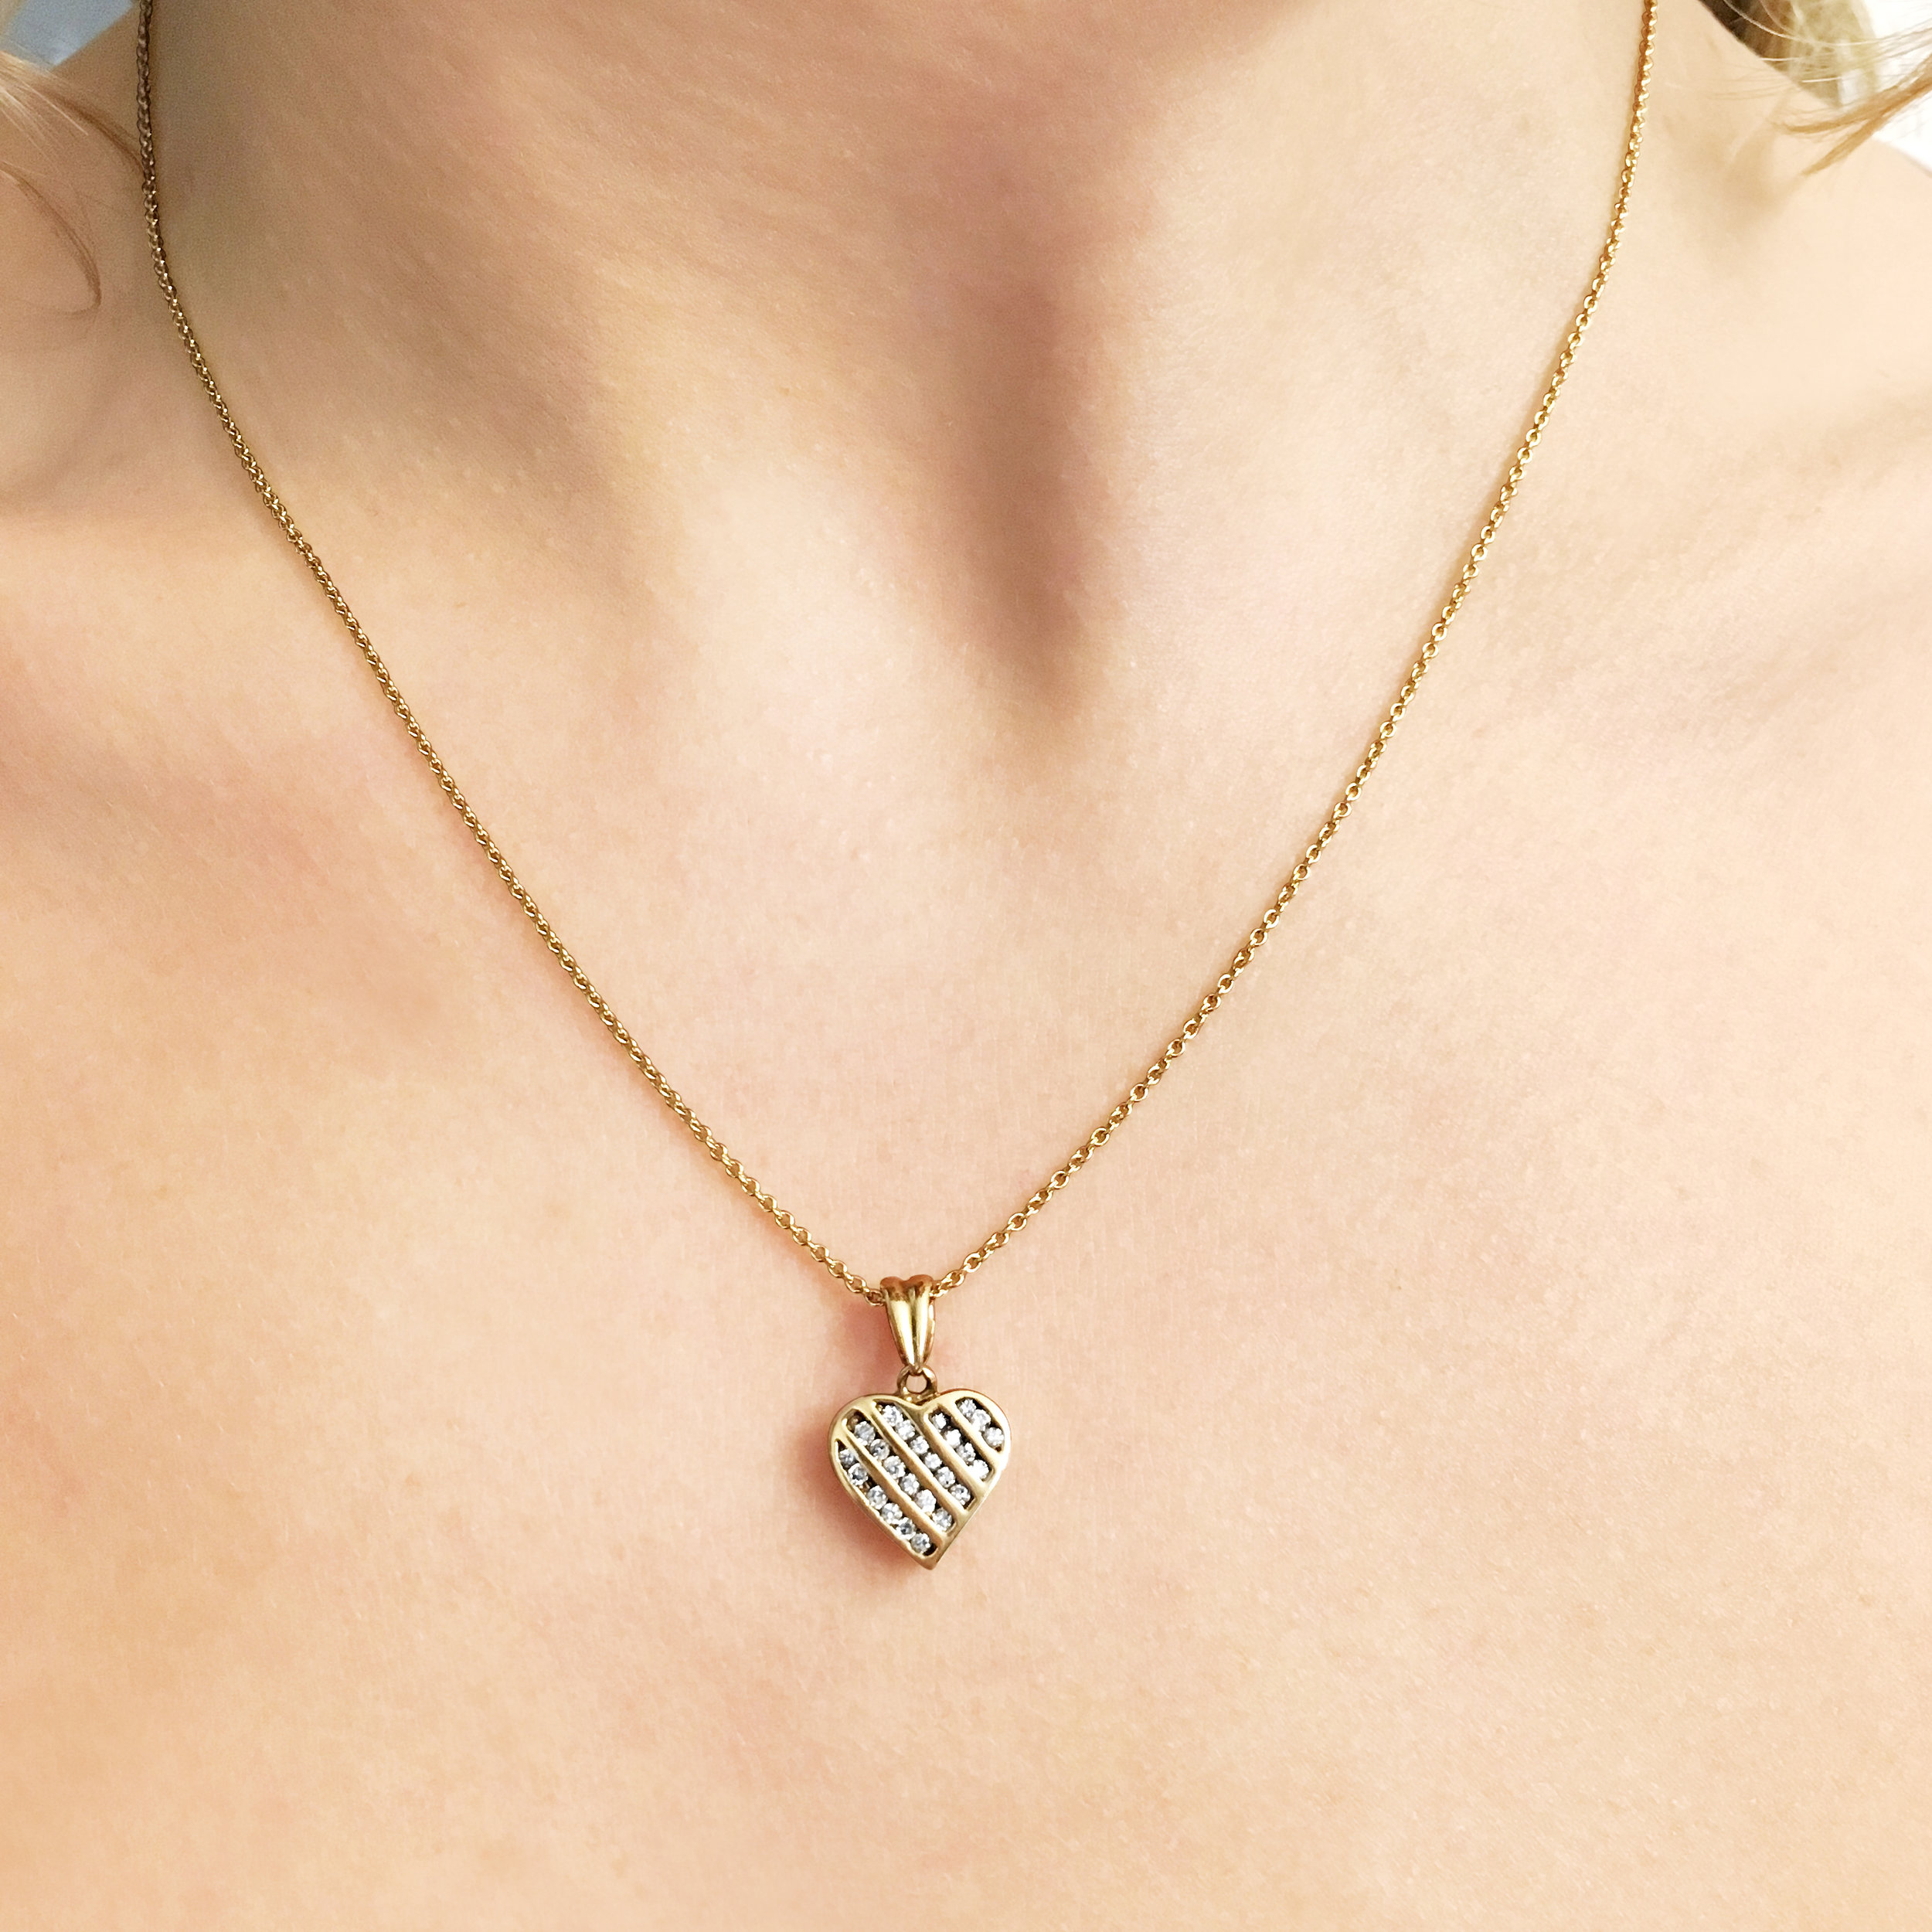 diamond-9ct-yellow-gold-heart-pendant-2.jpg